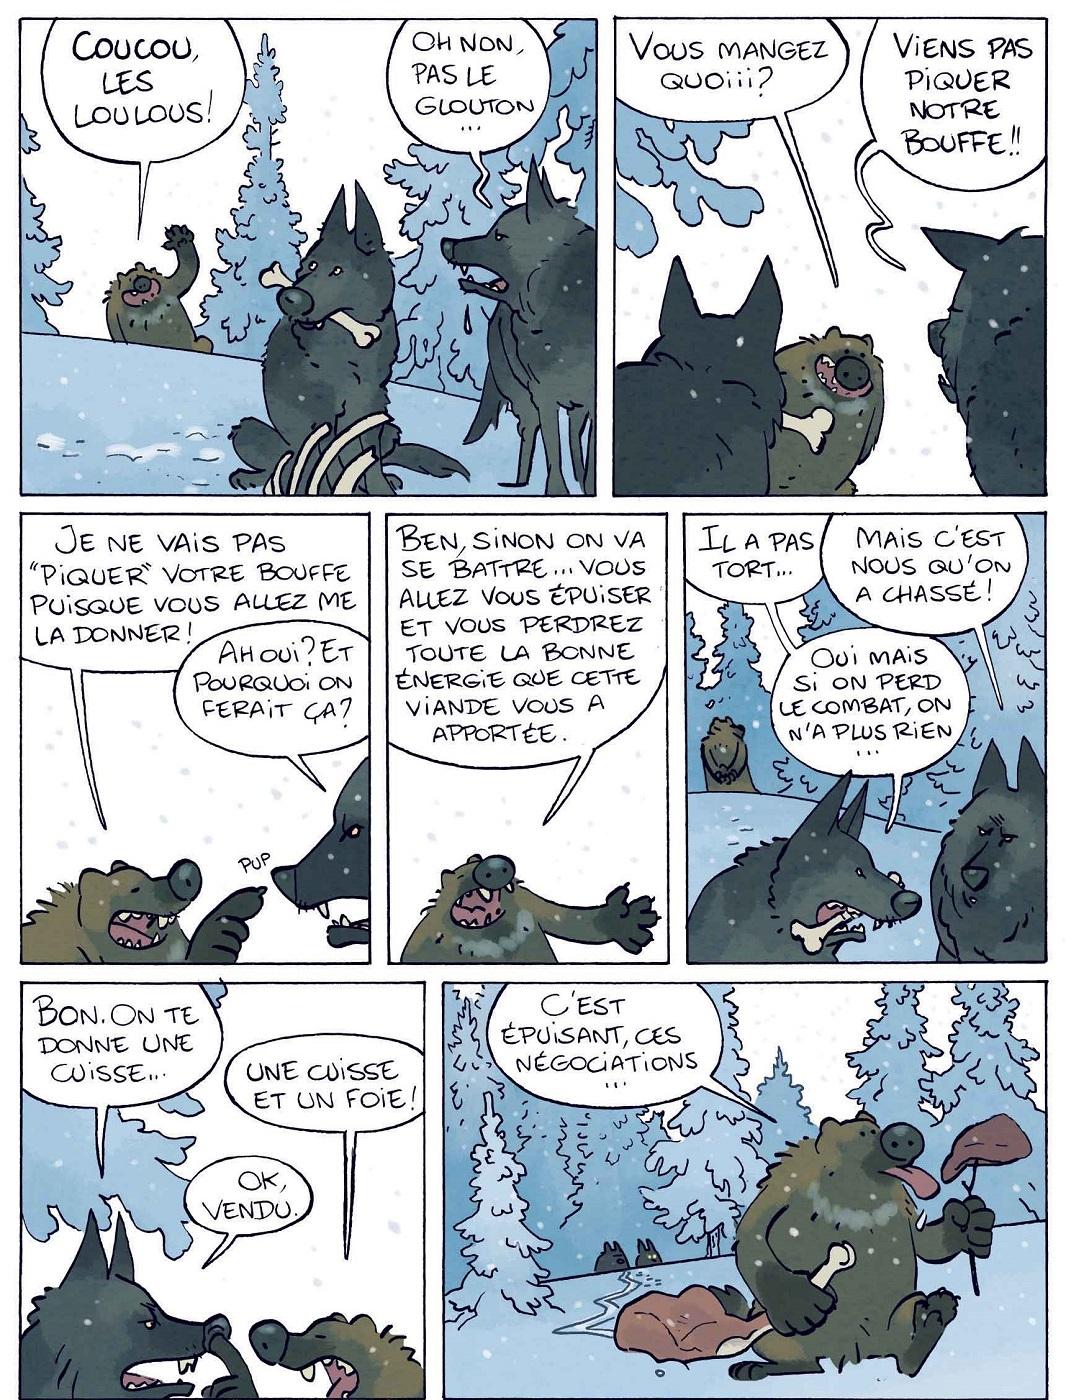 Glouton page 8